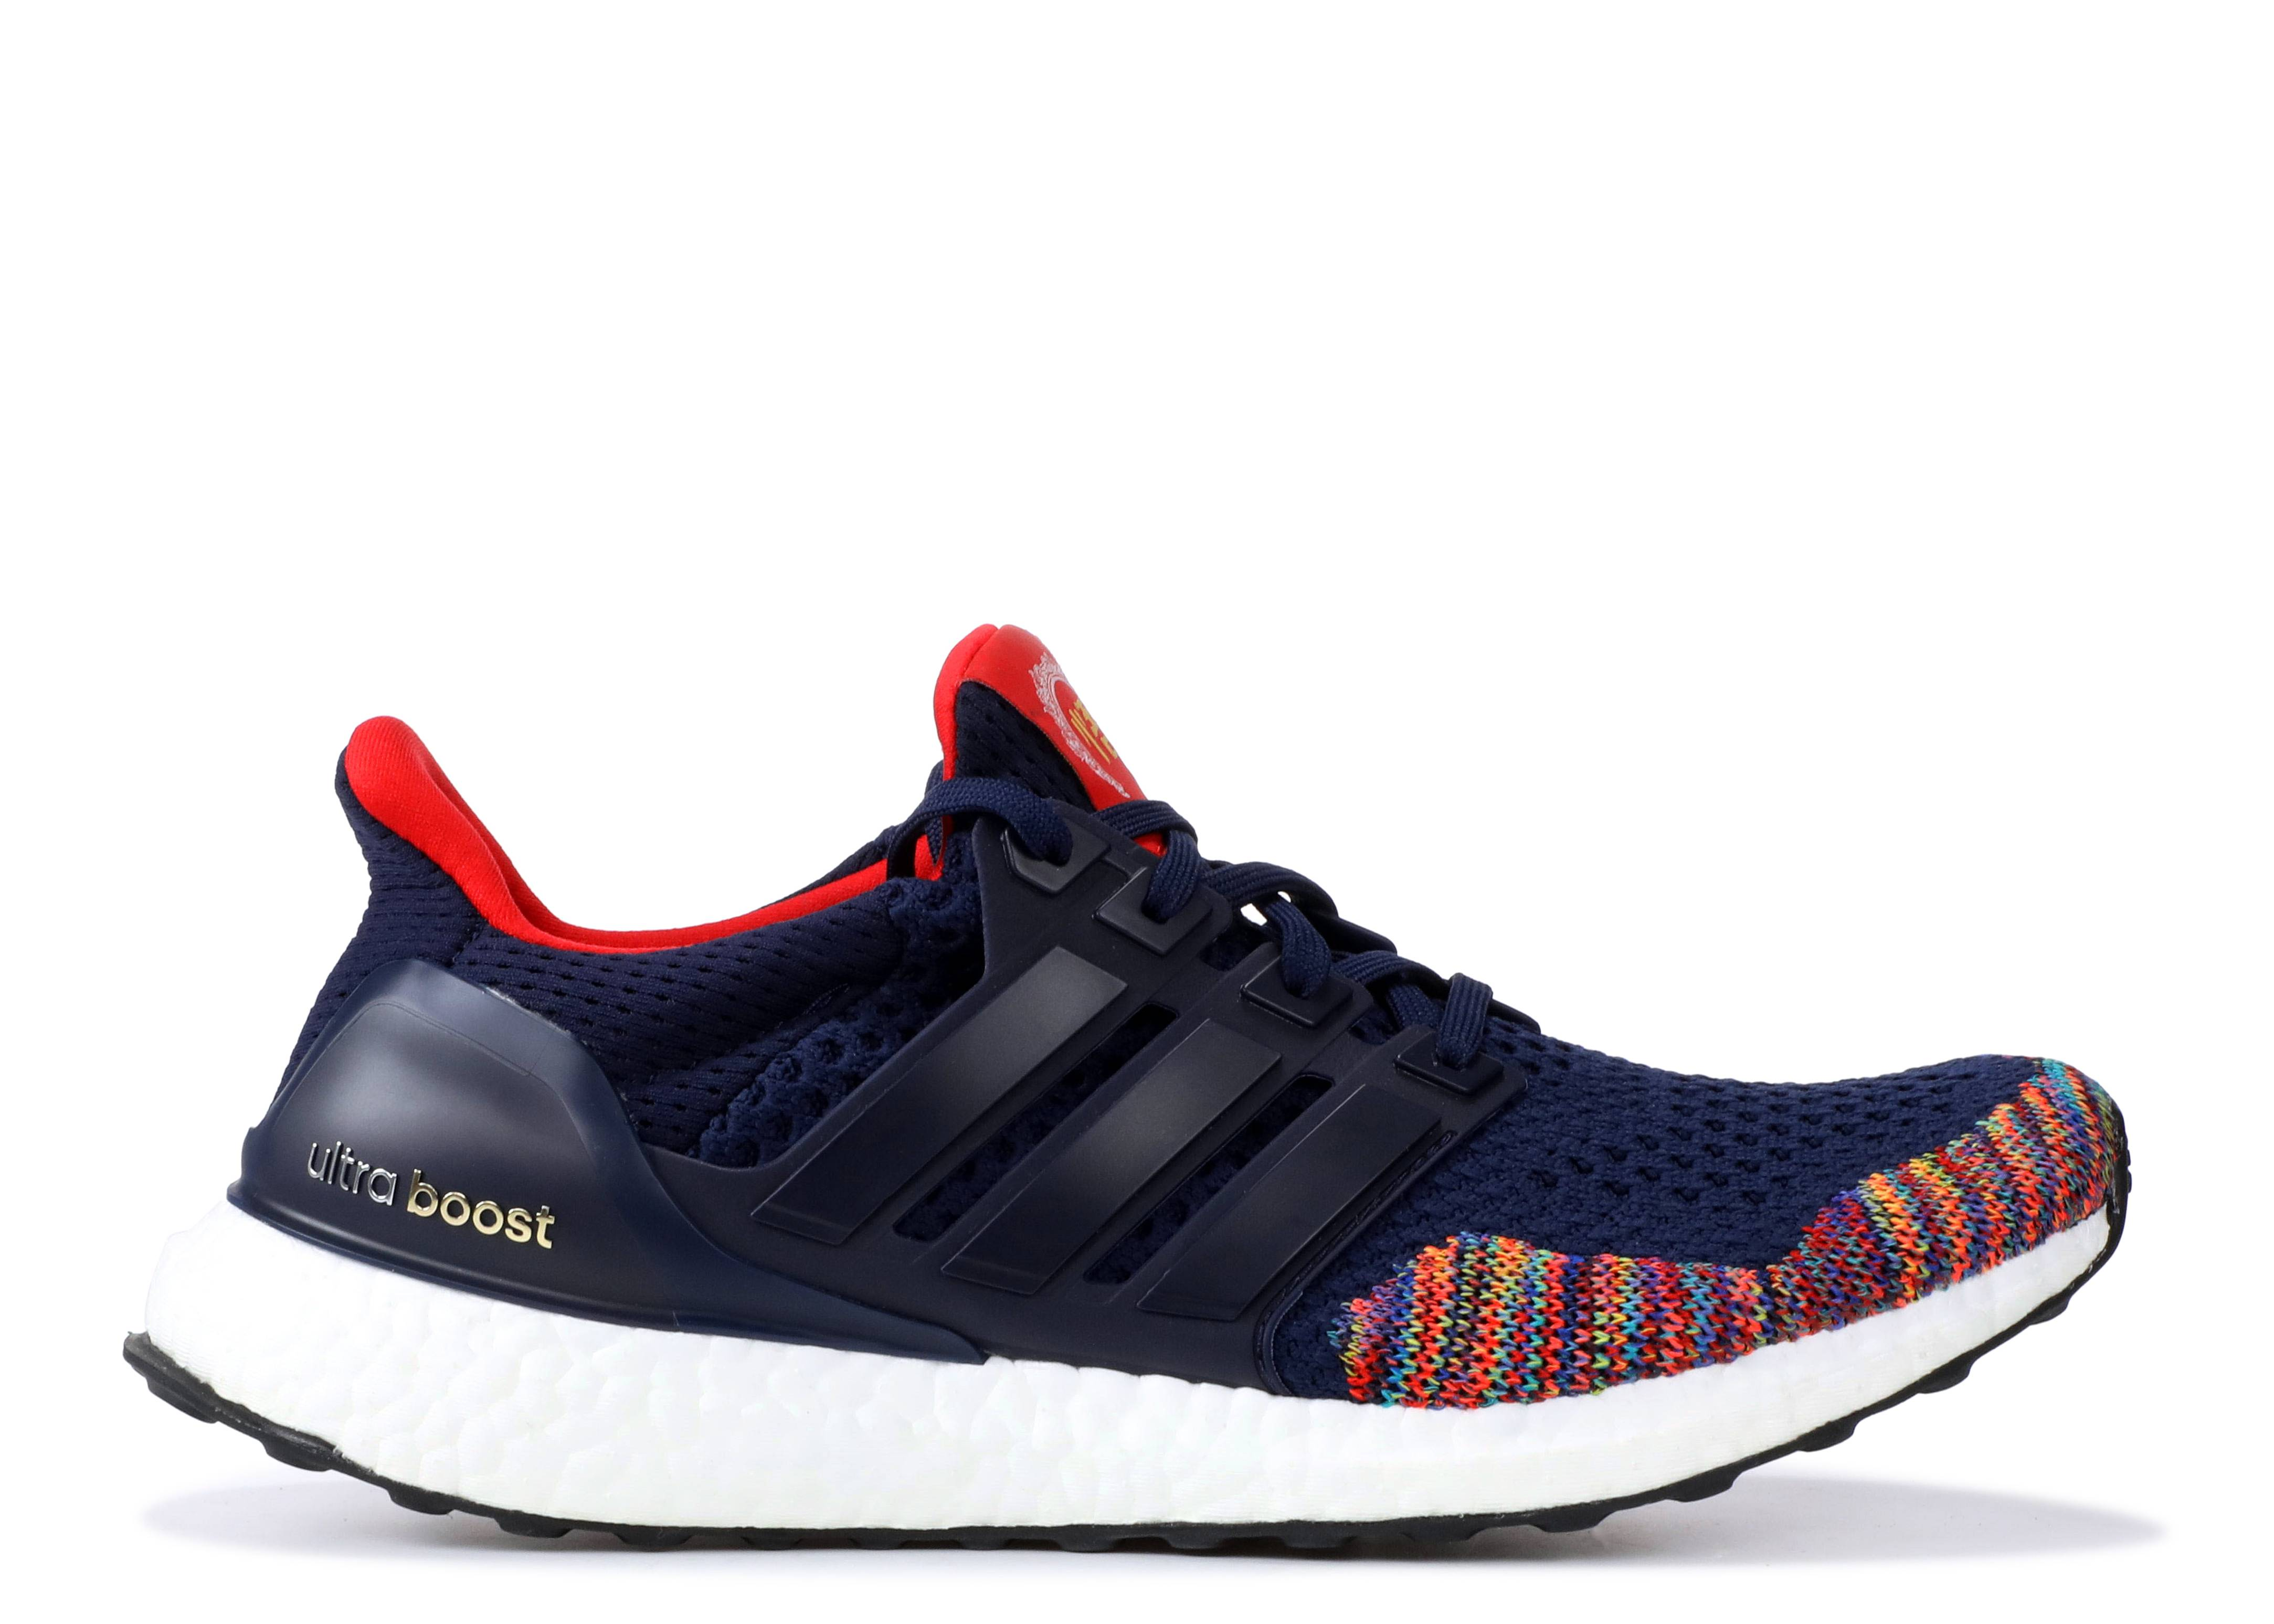 Cheap Adidas Ultra 3.0 Running Shoes Sale Online 2017